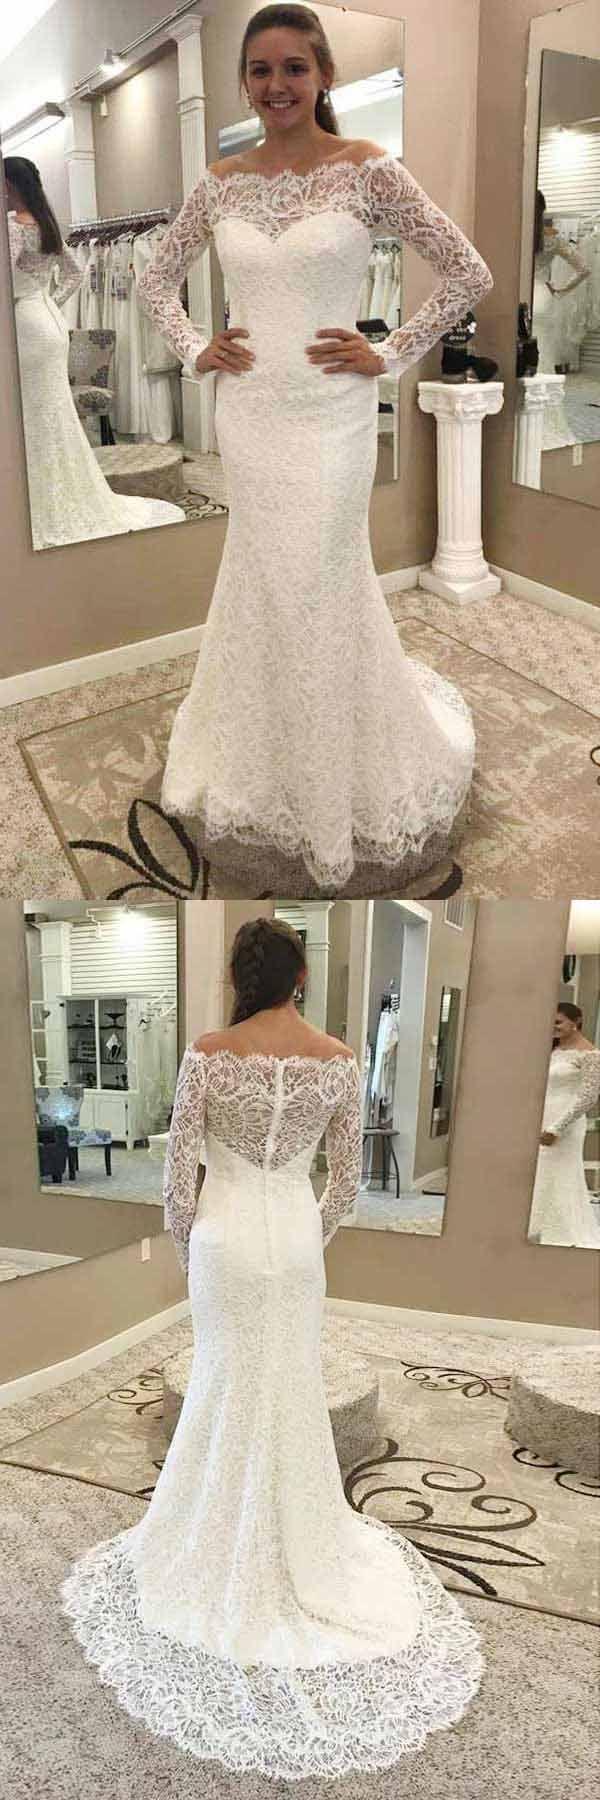 Mermaid dress wedding  Mermaid OfftheShoulder Lace Wedding Dress with Long Sleeves WD